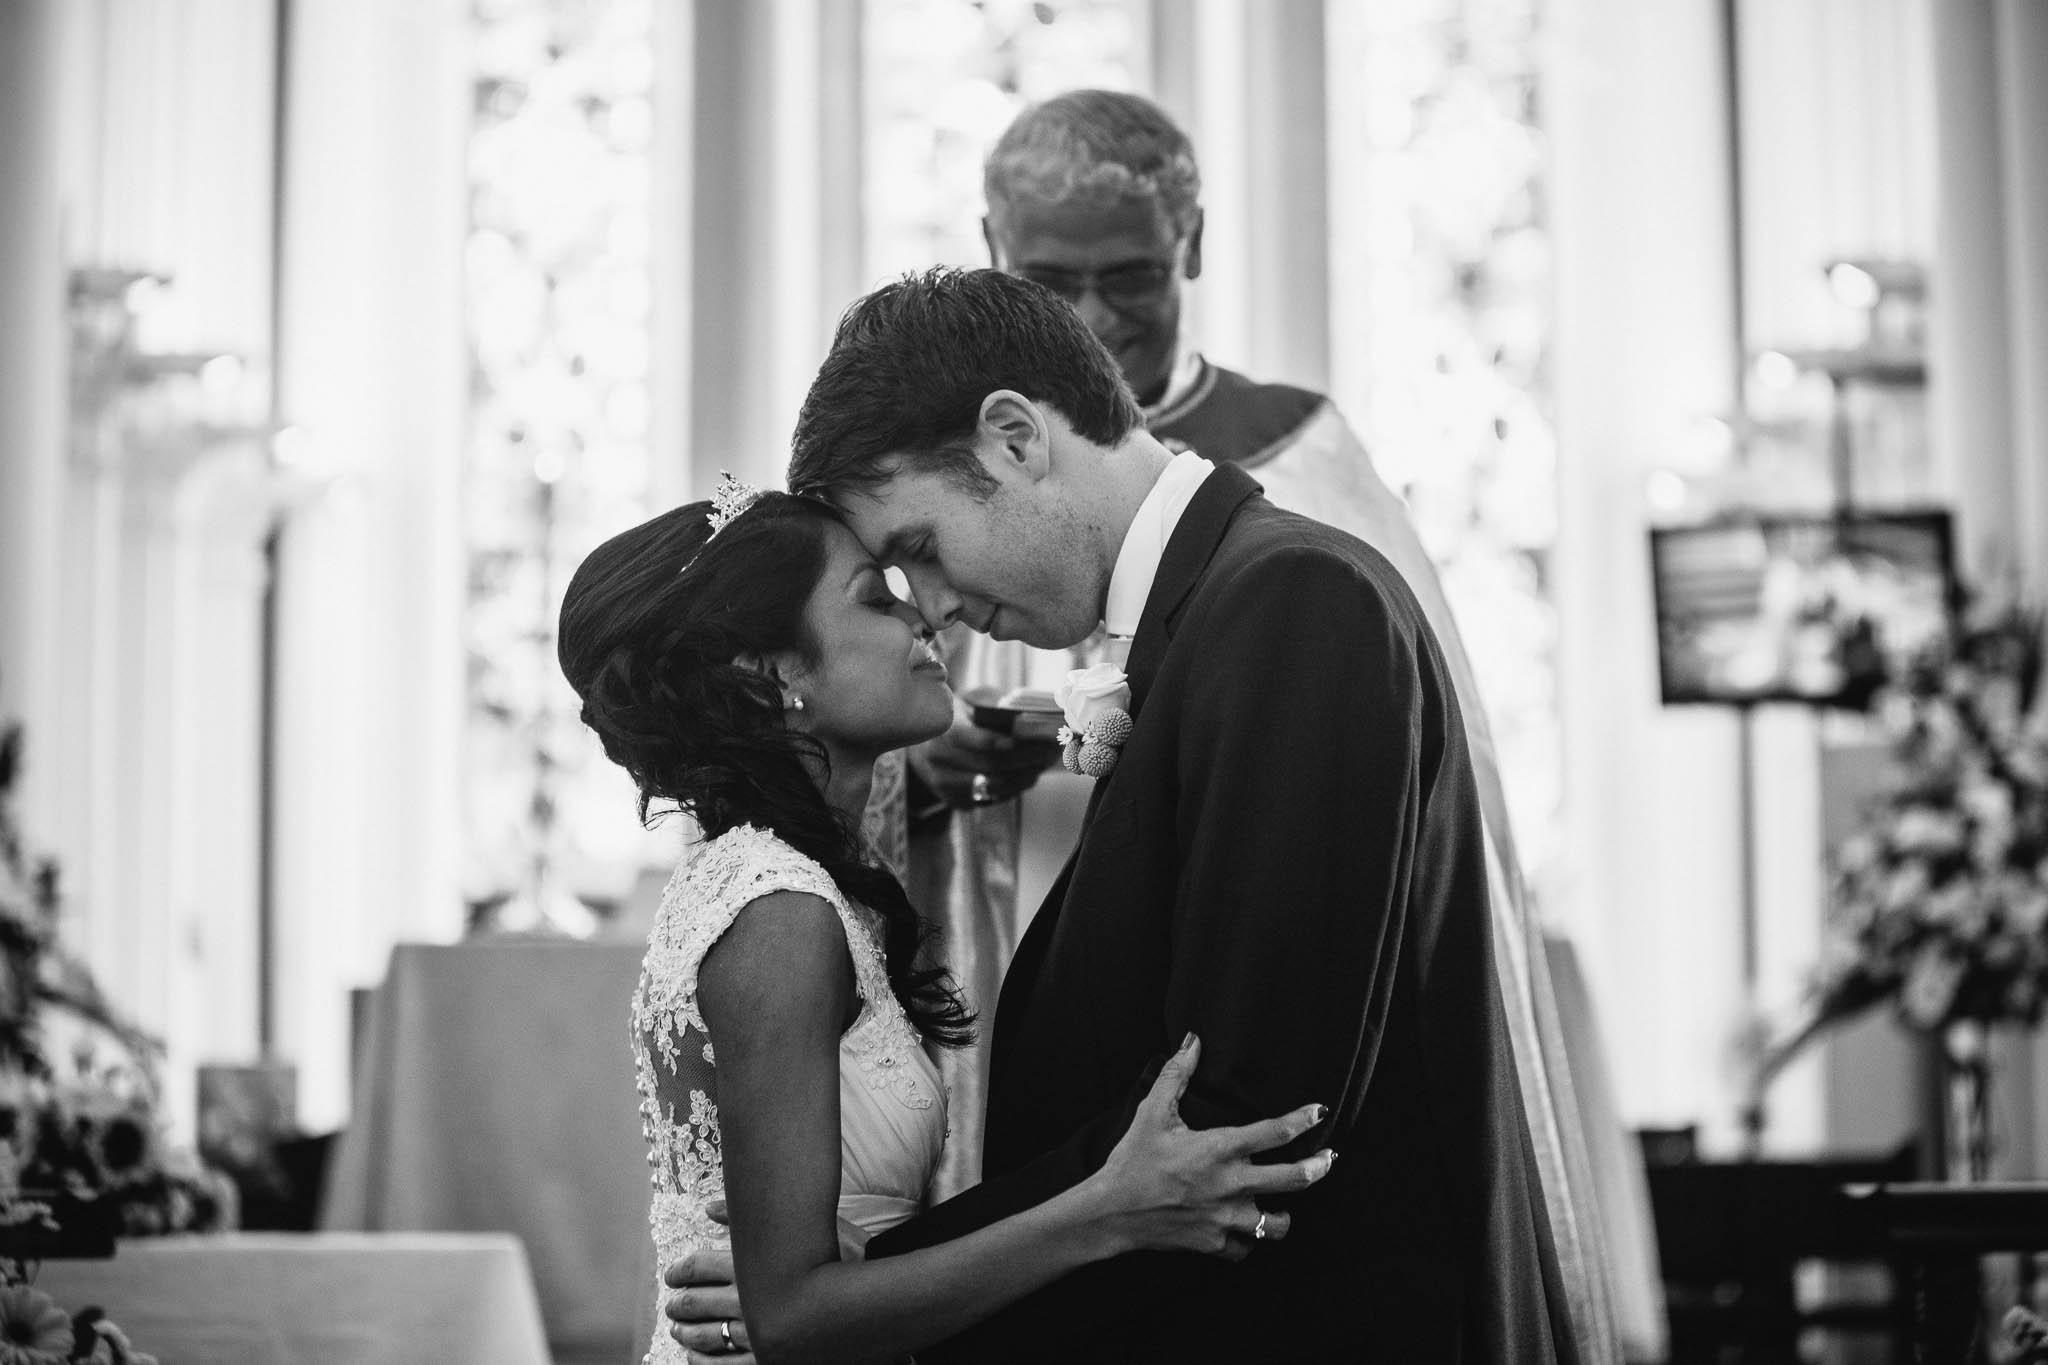 singapore-wedding-photographer-malay-indian-pre-wedding-travel-wmt-2015-41.jpg